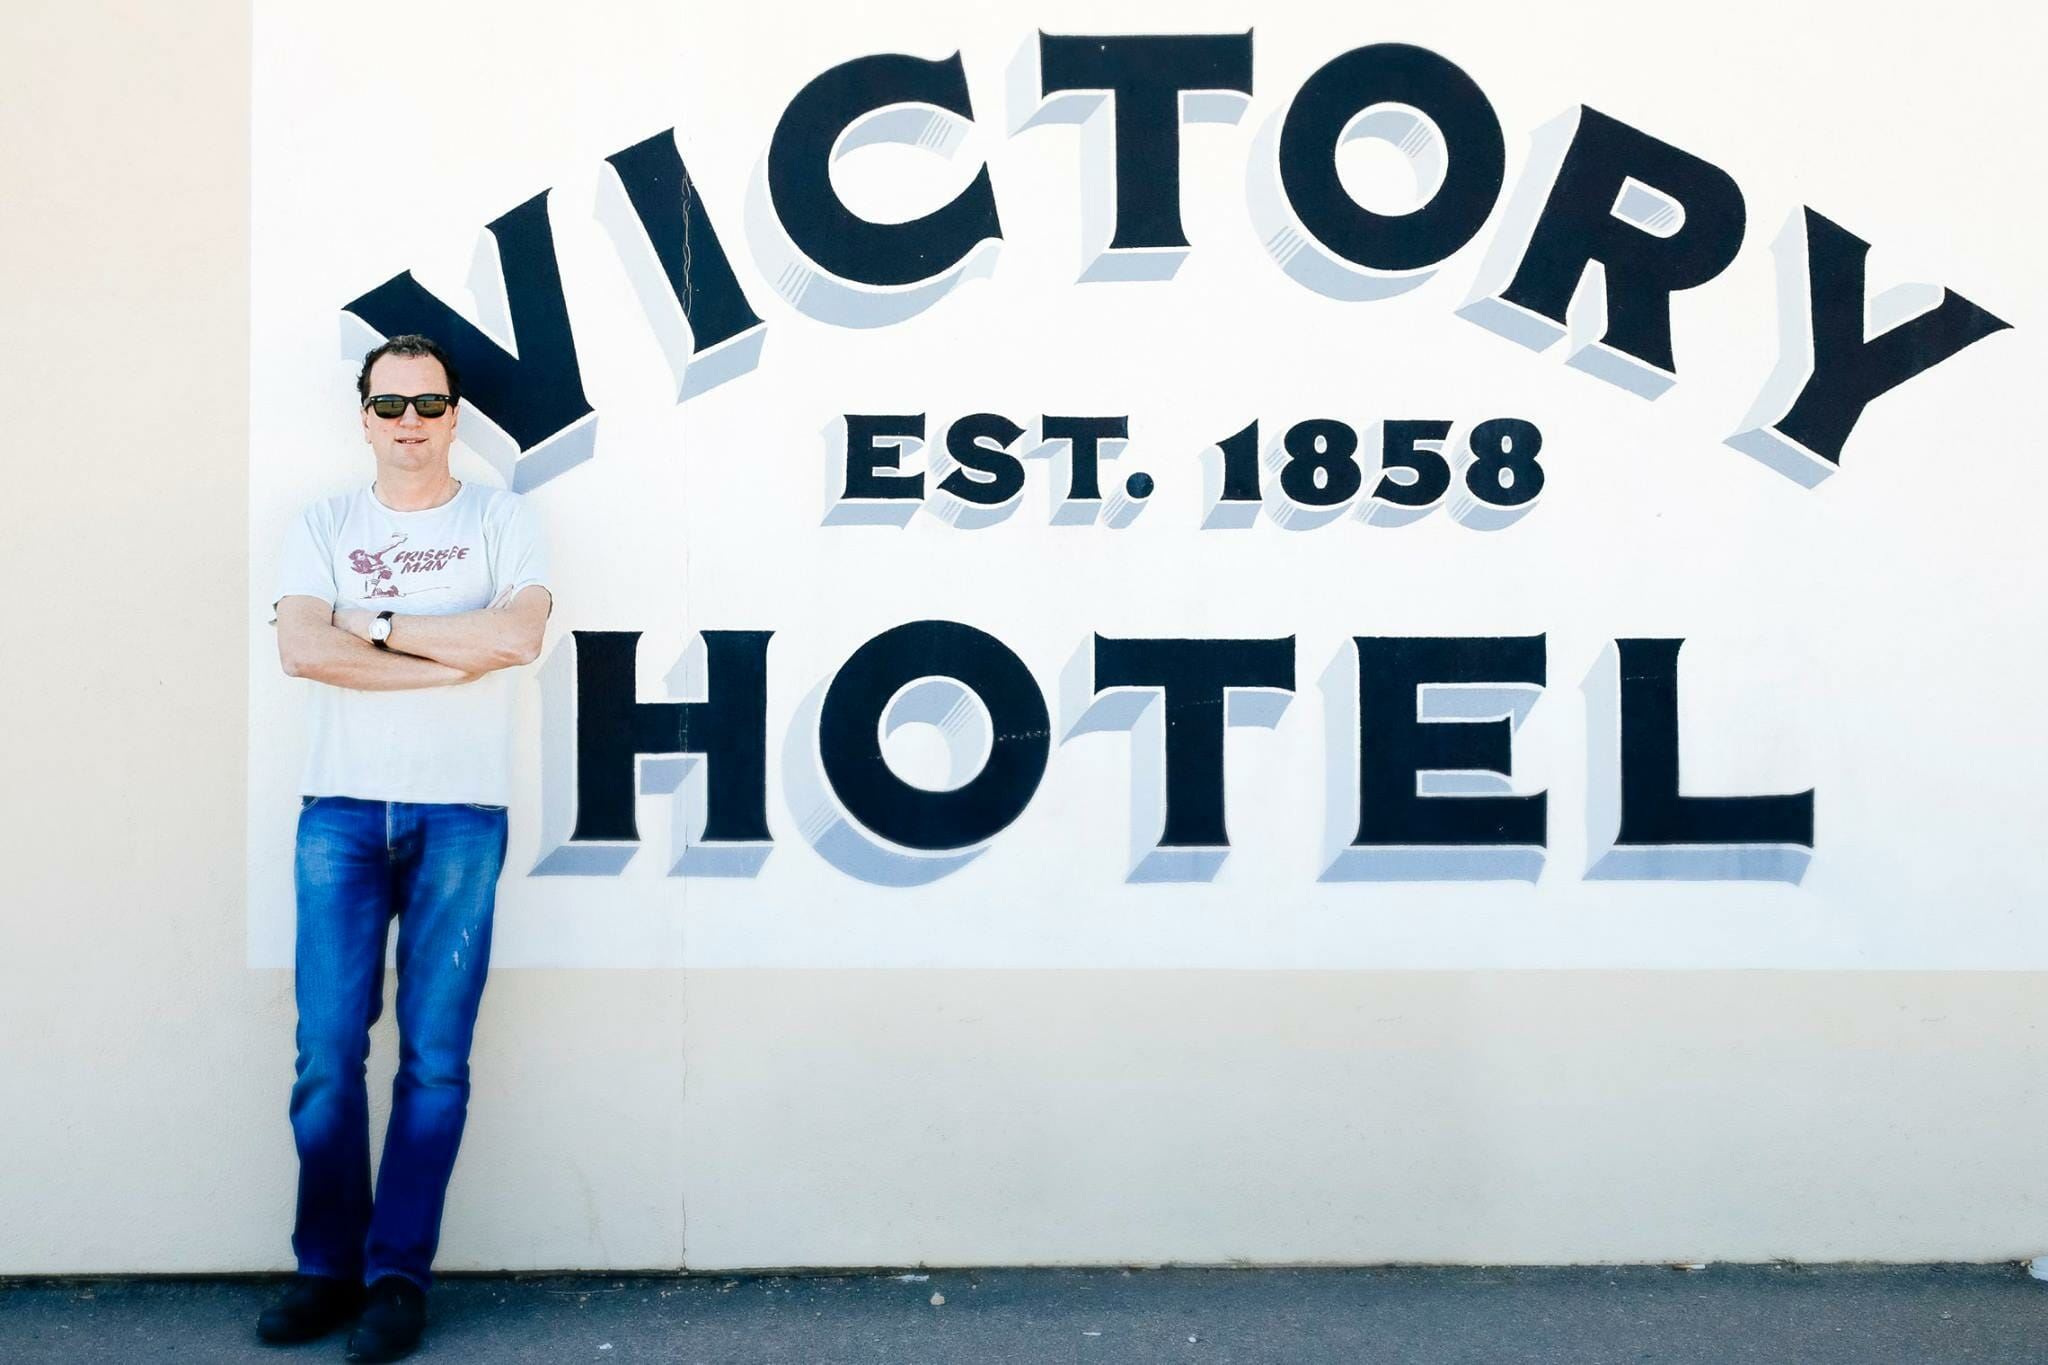 Victory Hotel - Doug Govan